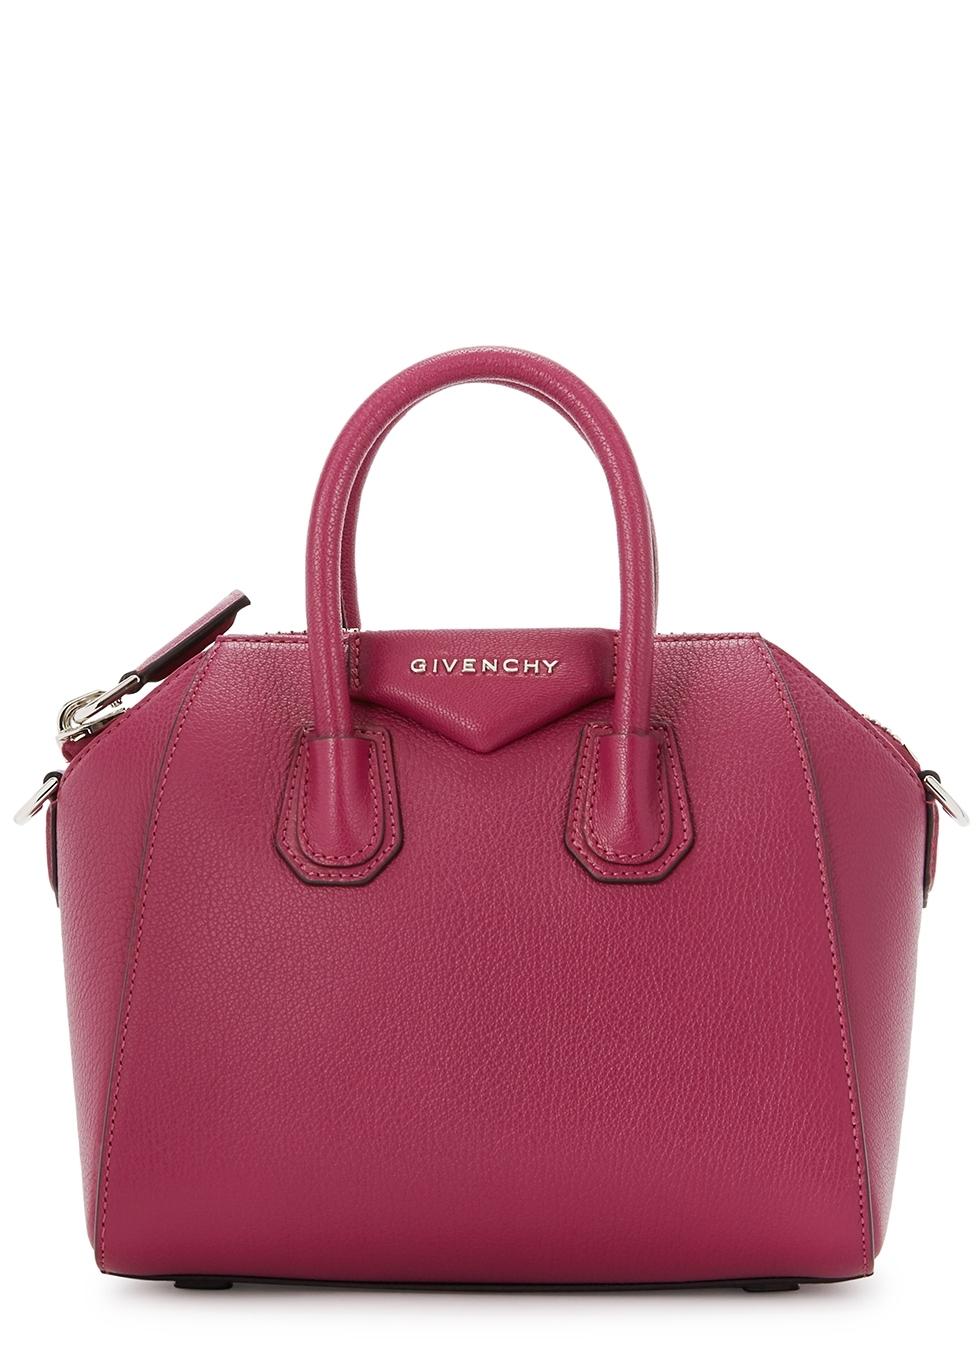 5989005dc0 Givenchy Antigona mini pink leather top handle bag - Harvey Nichols